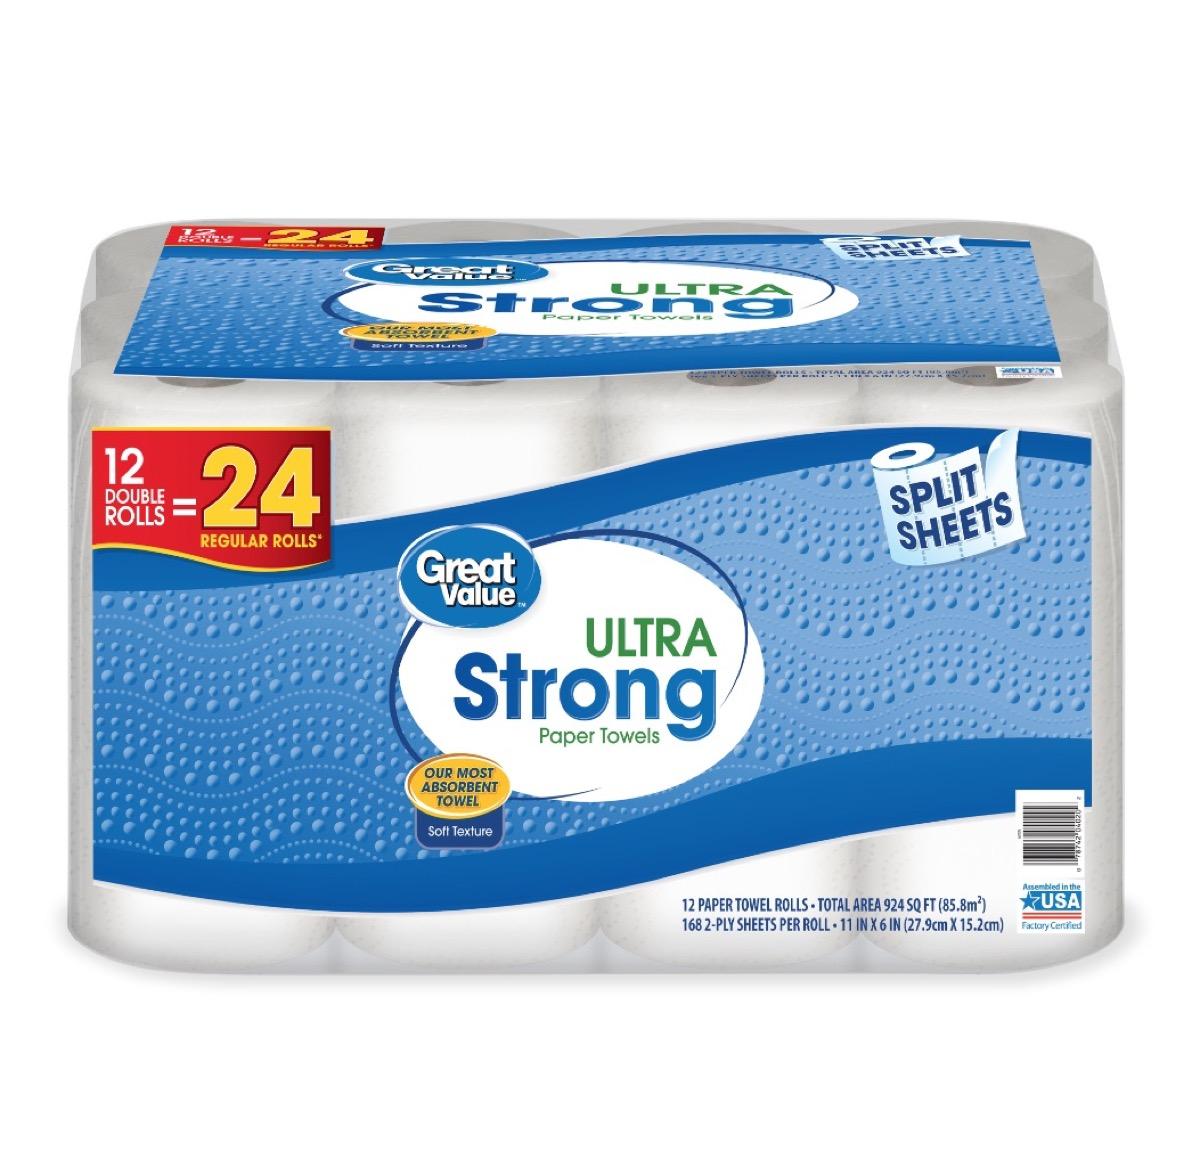 Great Value Paper Towel Rolls